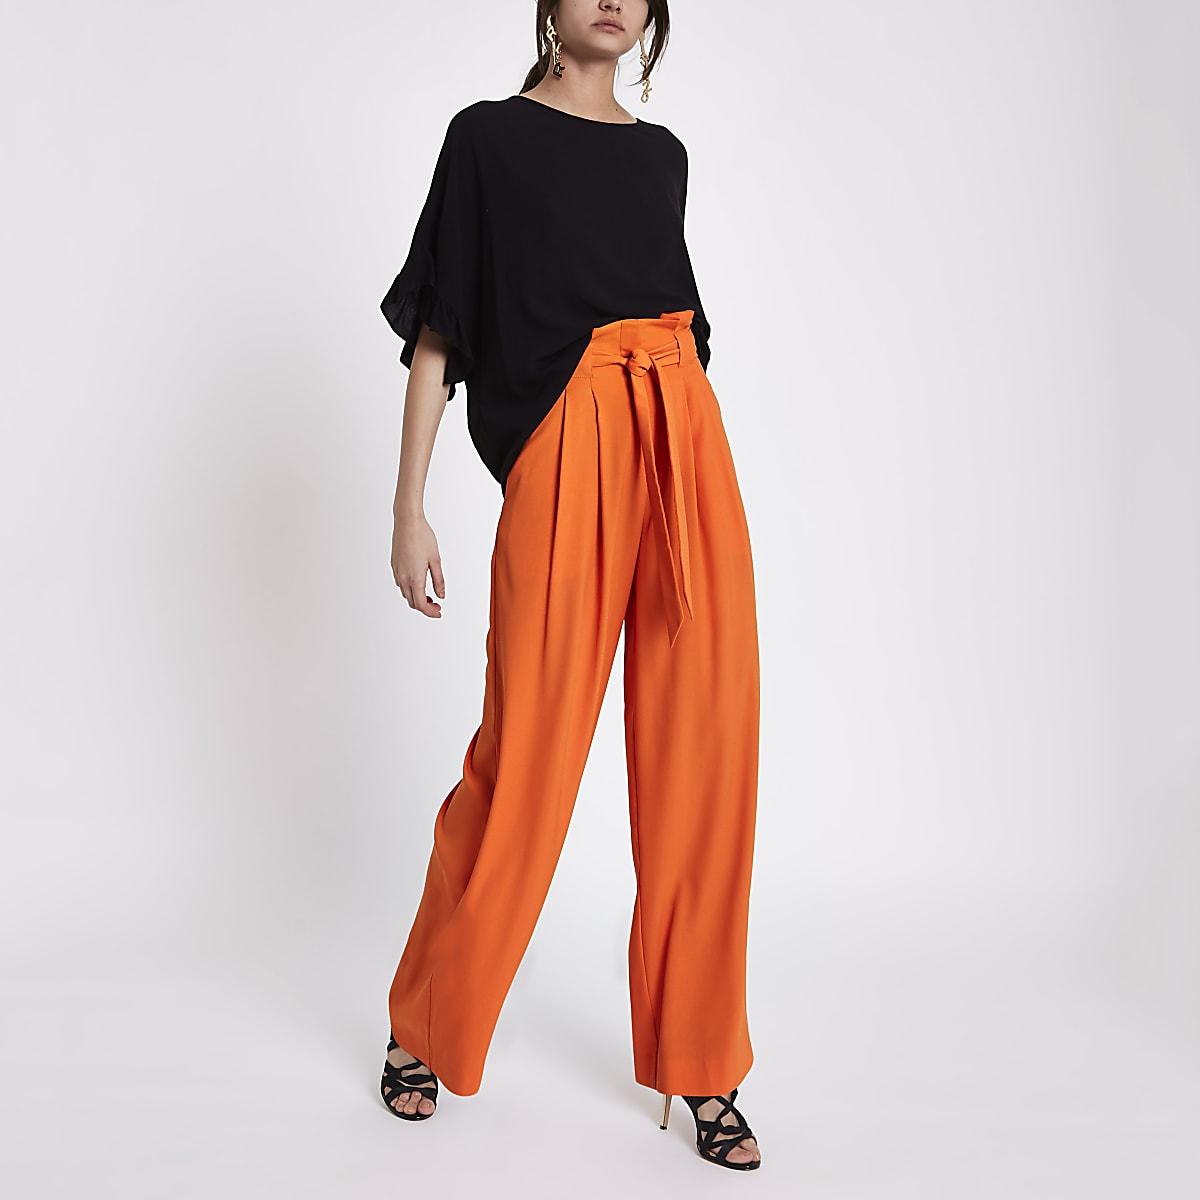 6ed1fa48a1 Orange paperbag waist wide leg trousers - Wide Leg Trousers - Trousers -  women